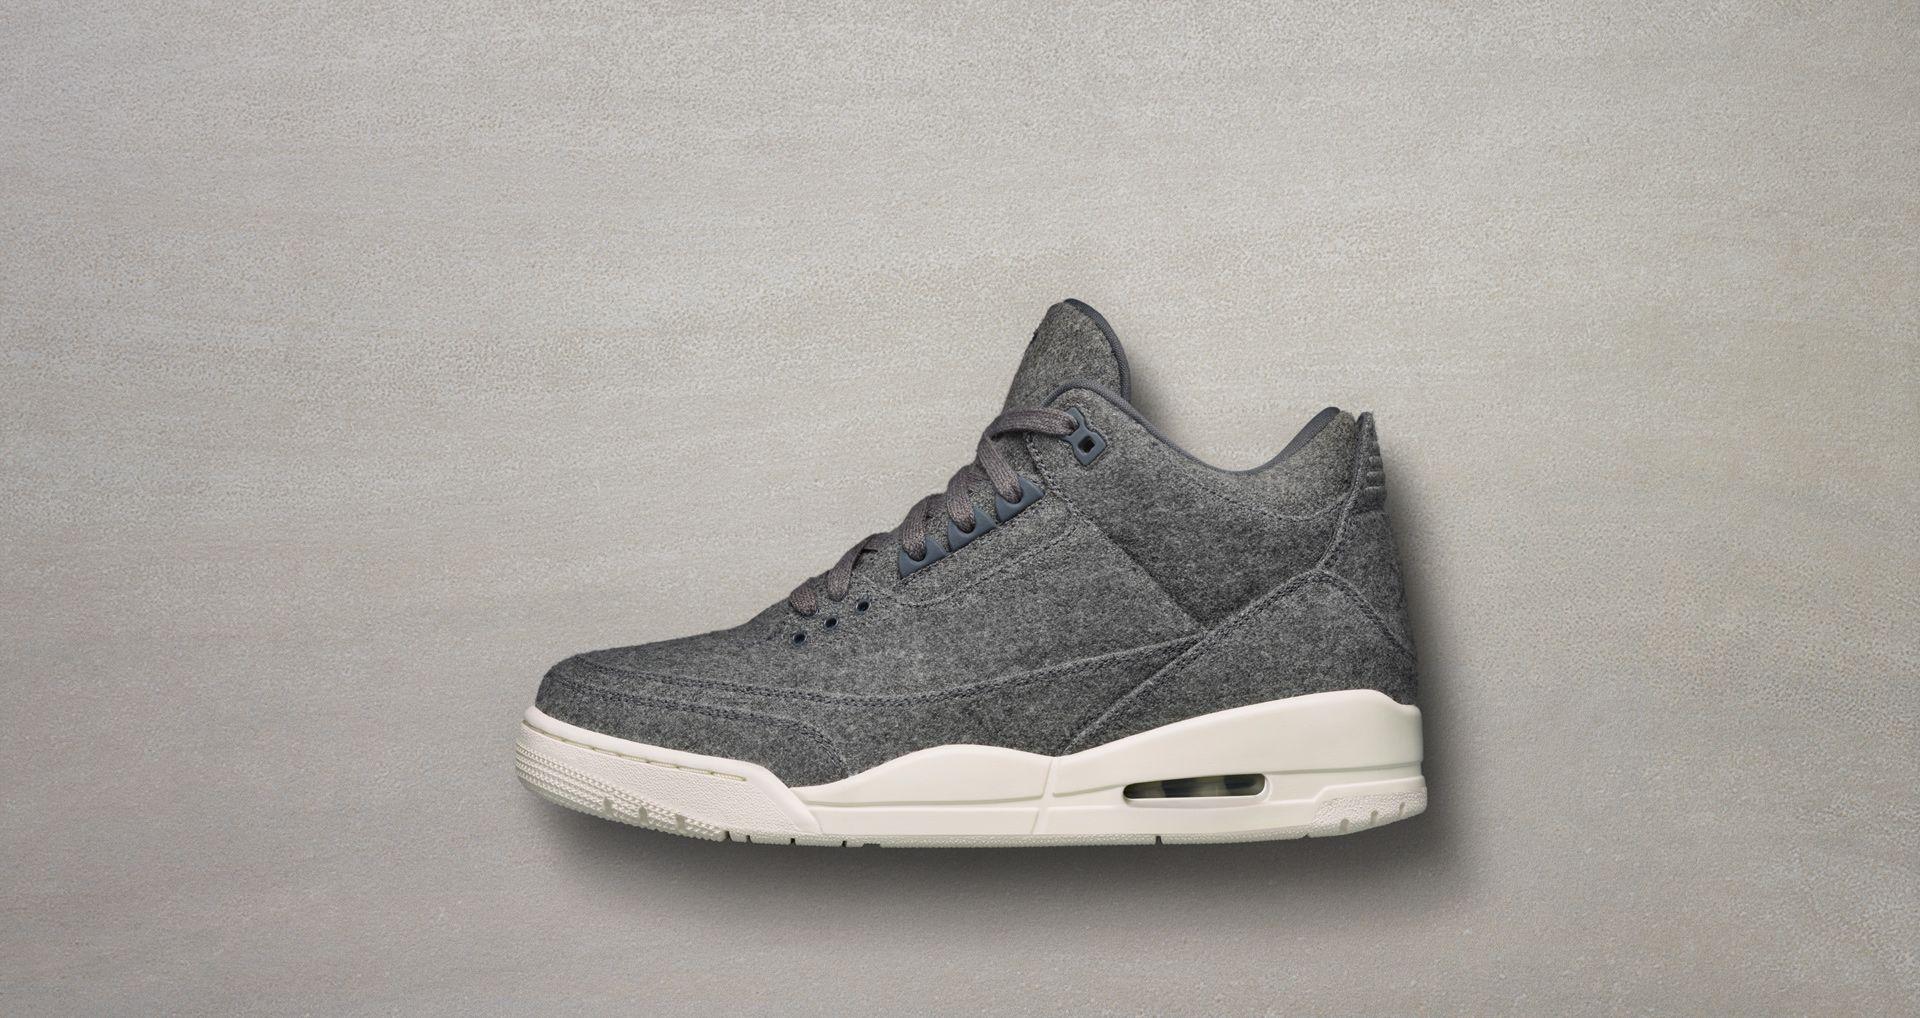 jordan 3 retro grey